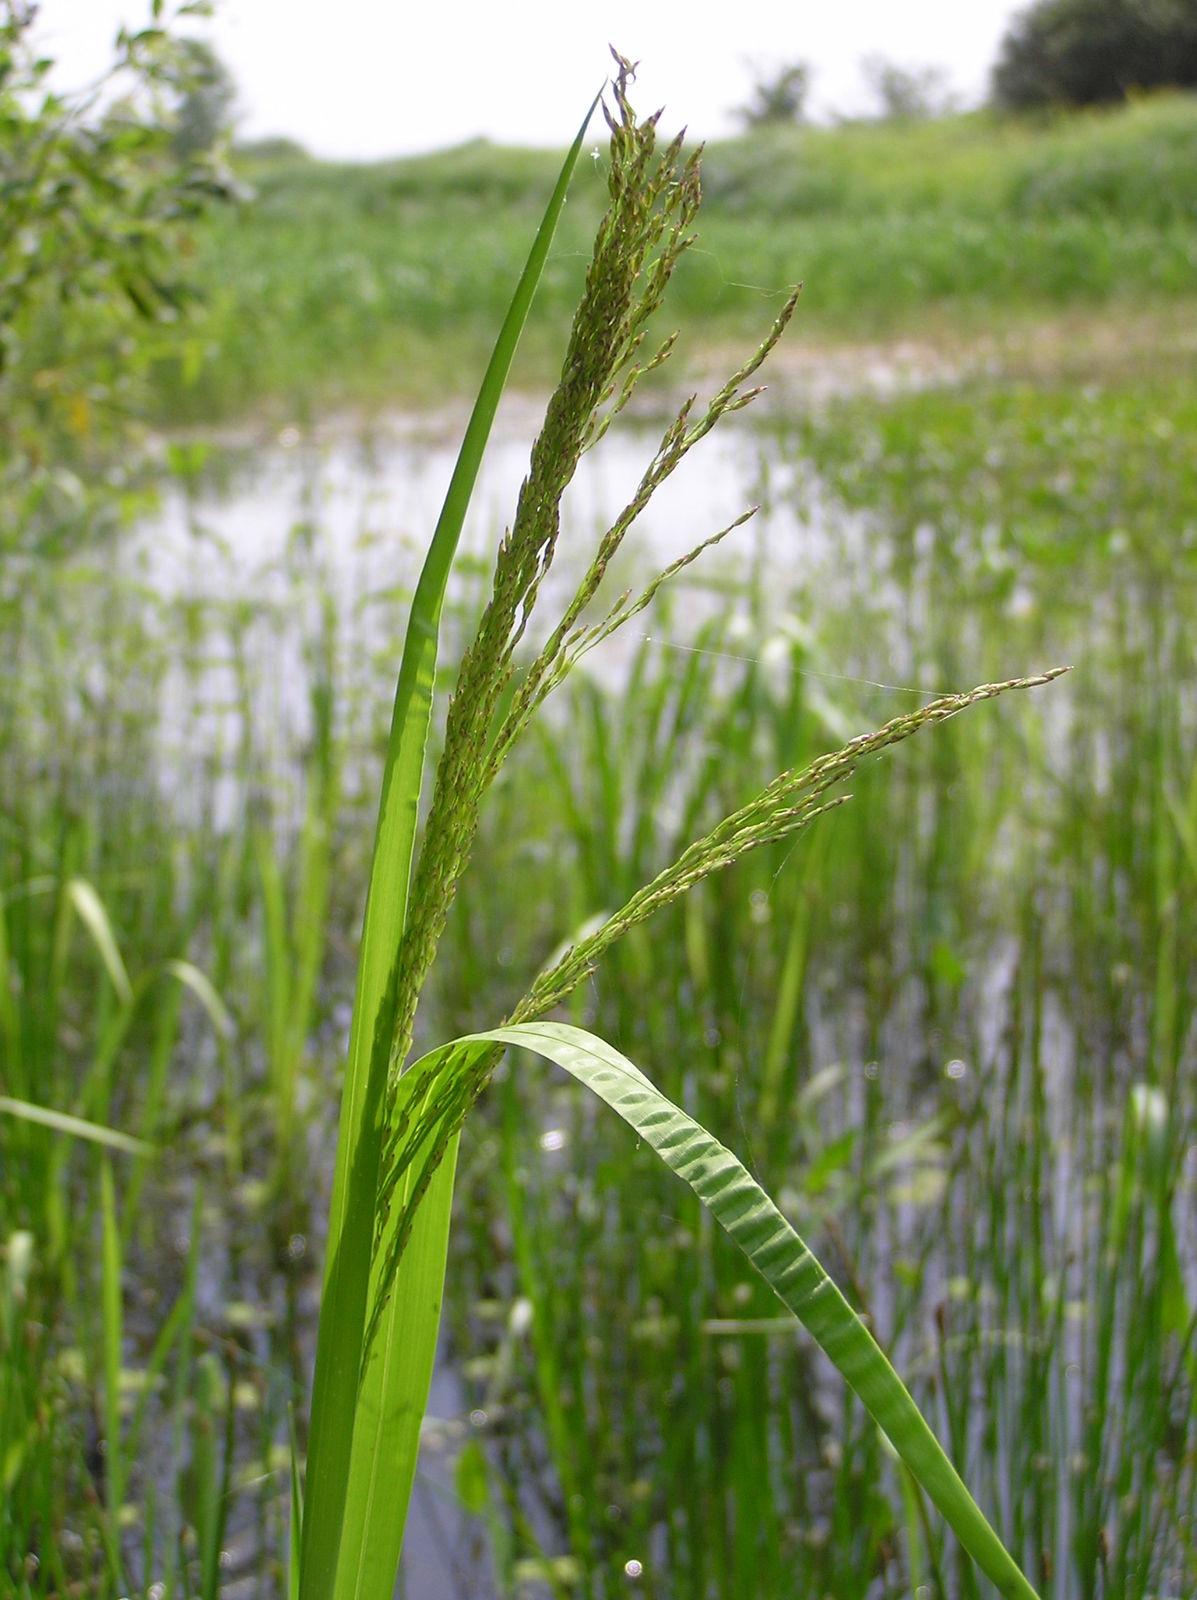 Glyceria maxima (Hartm.) Holmb. | Plants of the World Online | Kew Science